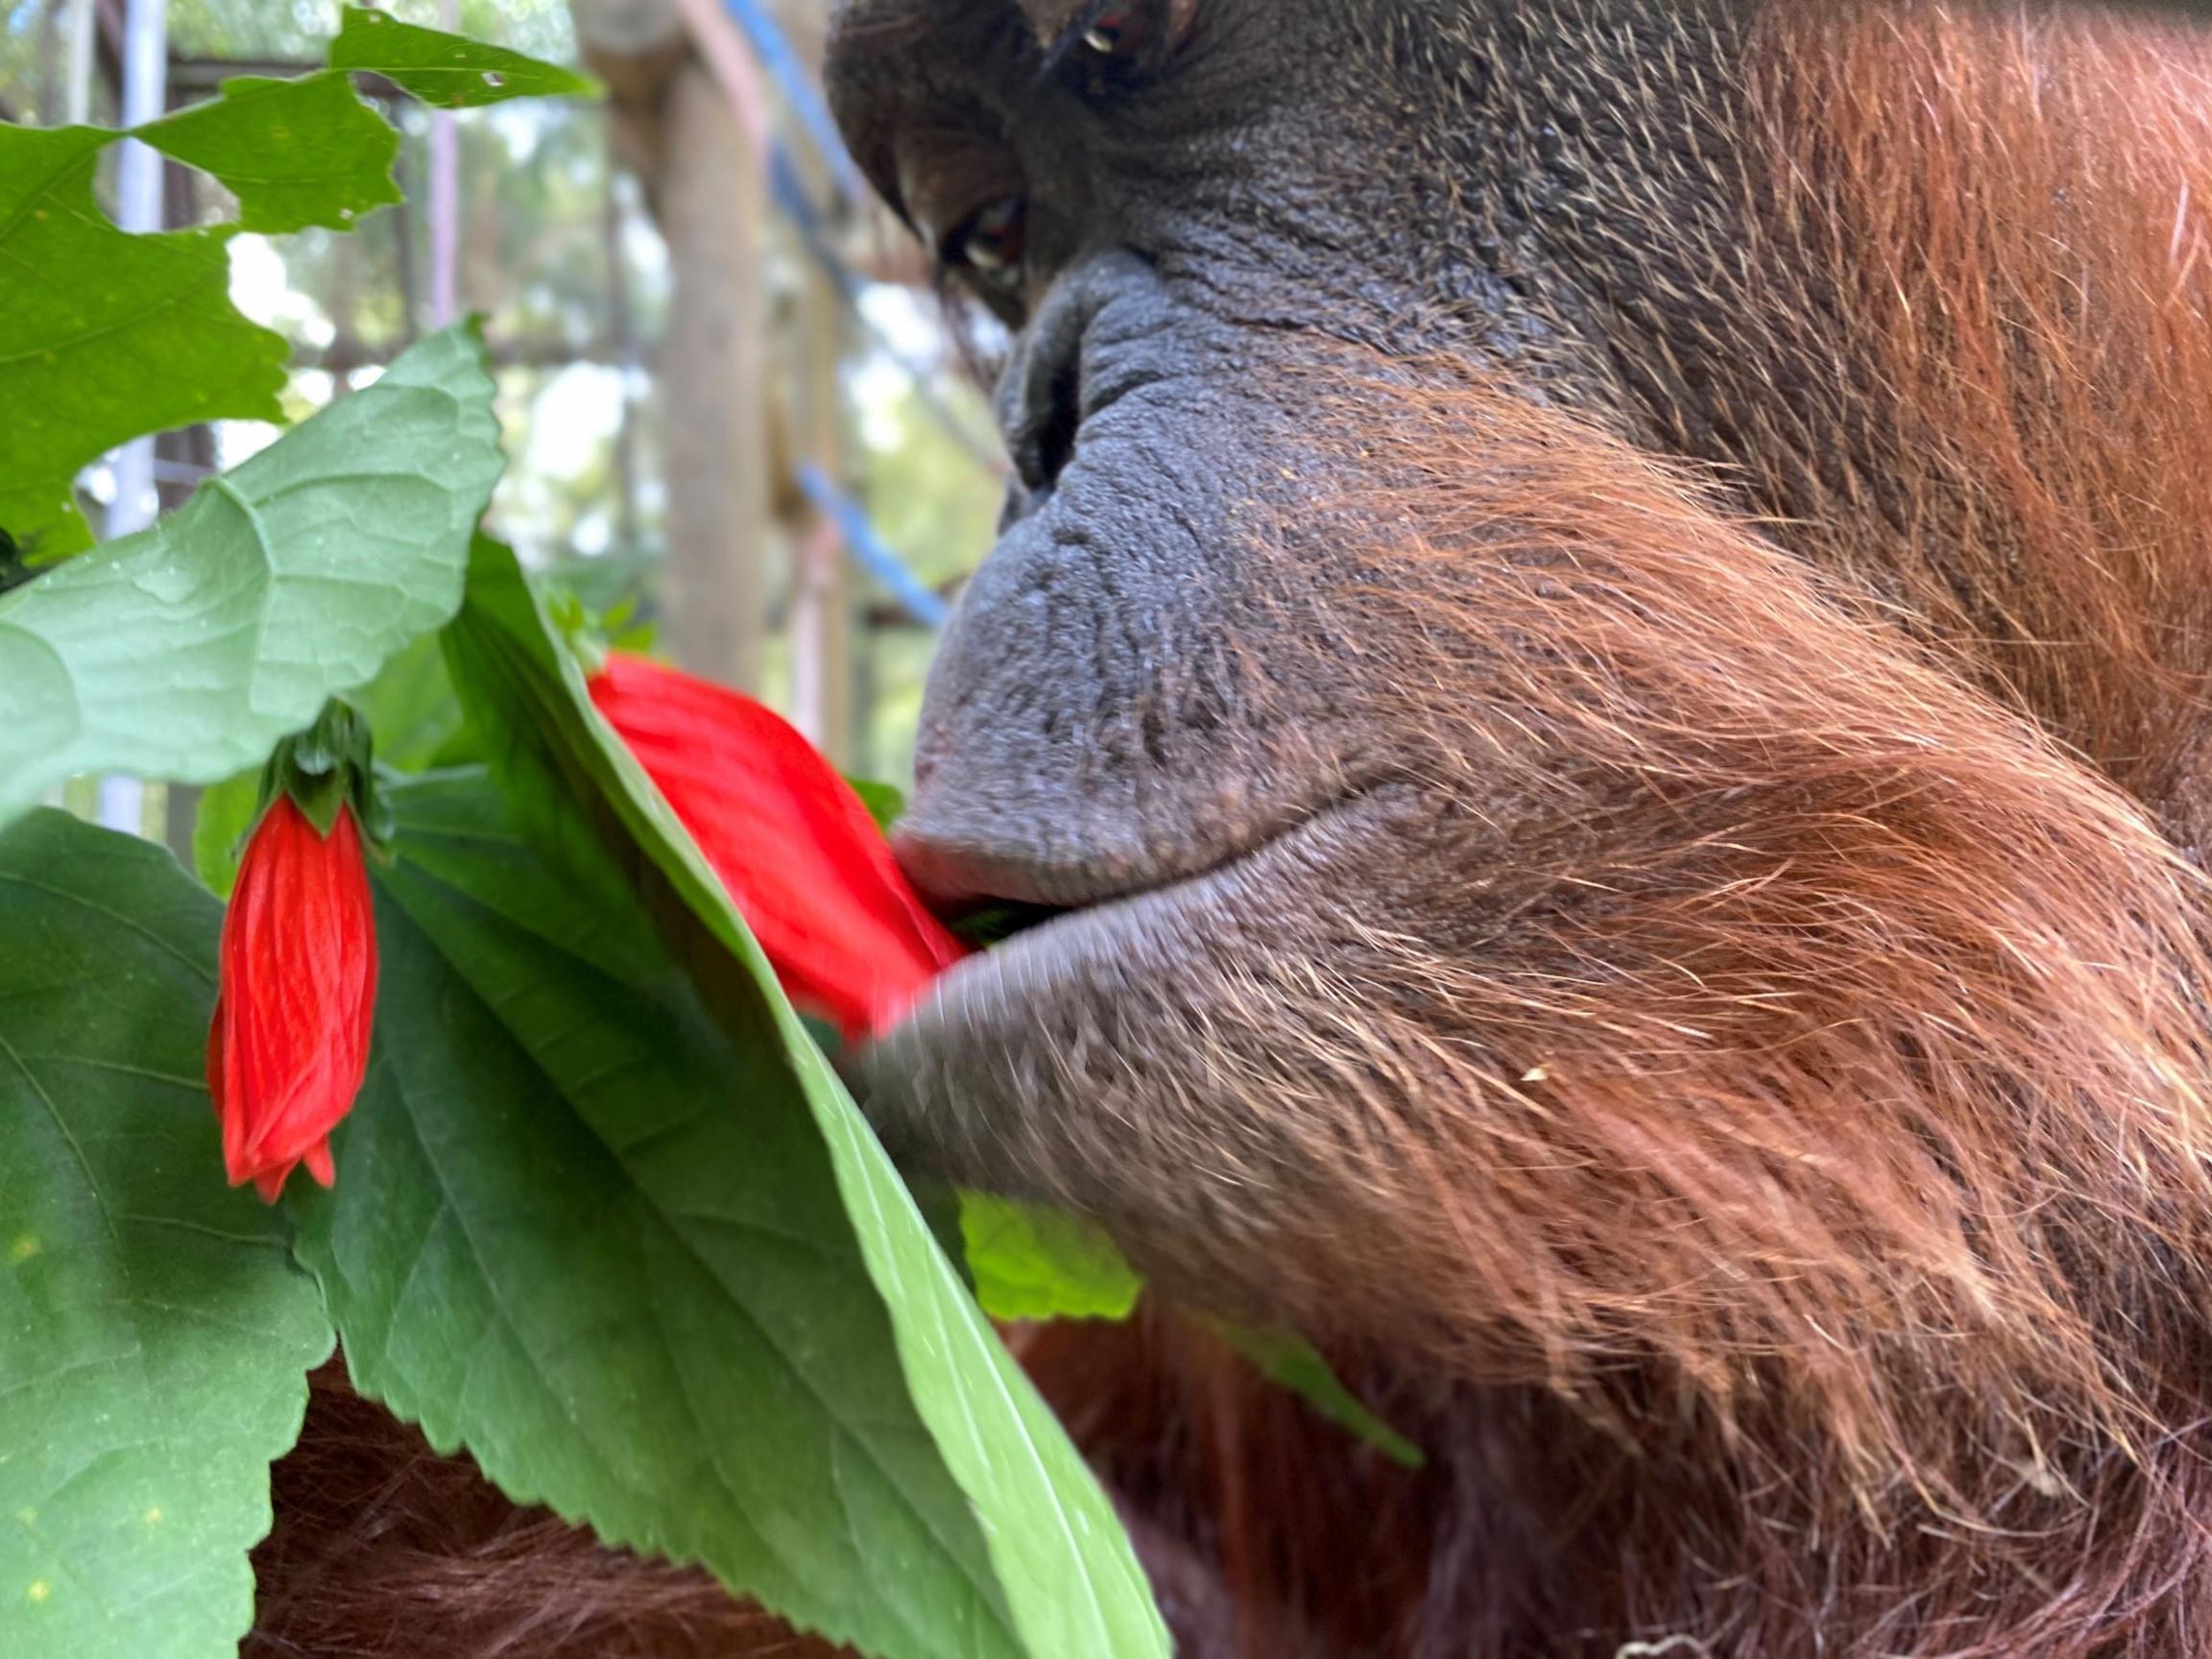 Sandra the orangutan tastes a wild hibiscus, Nov. 12, 2019.